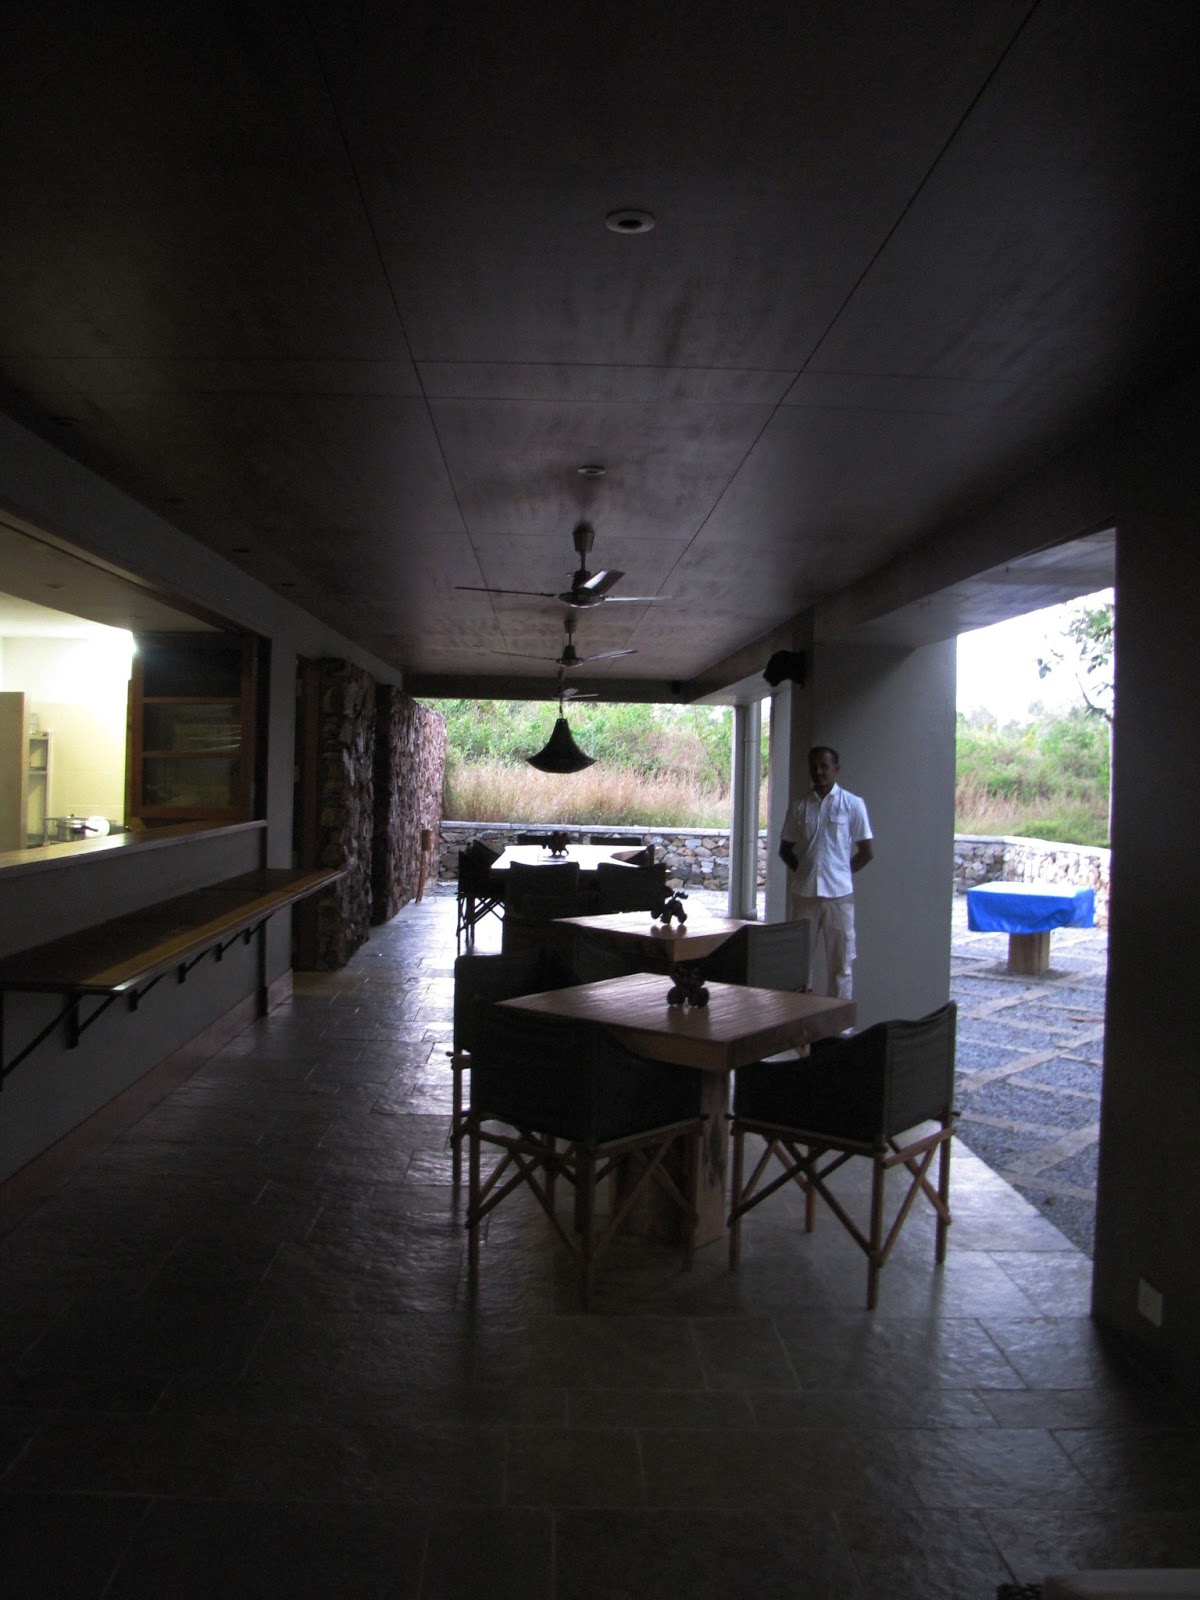 Architecture student 39 s corner 39 kaav safari lodge in for Architecture firms for internship in india